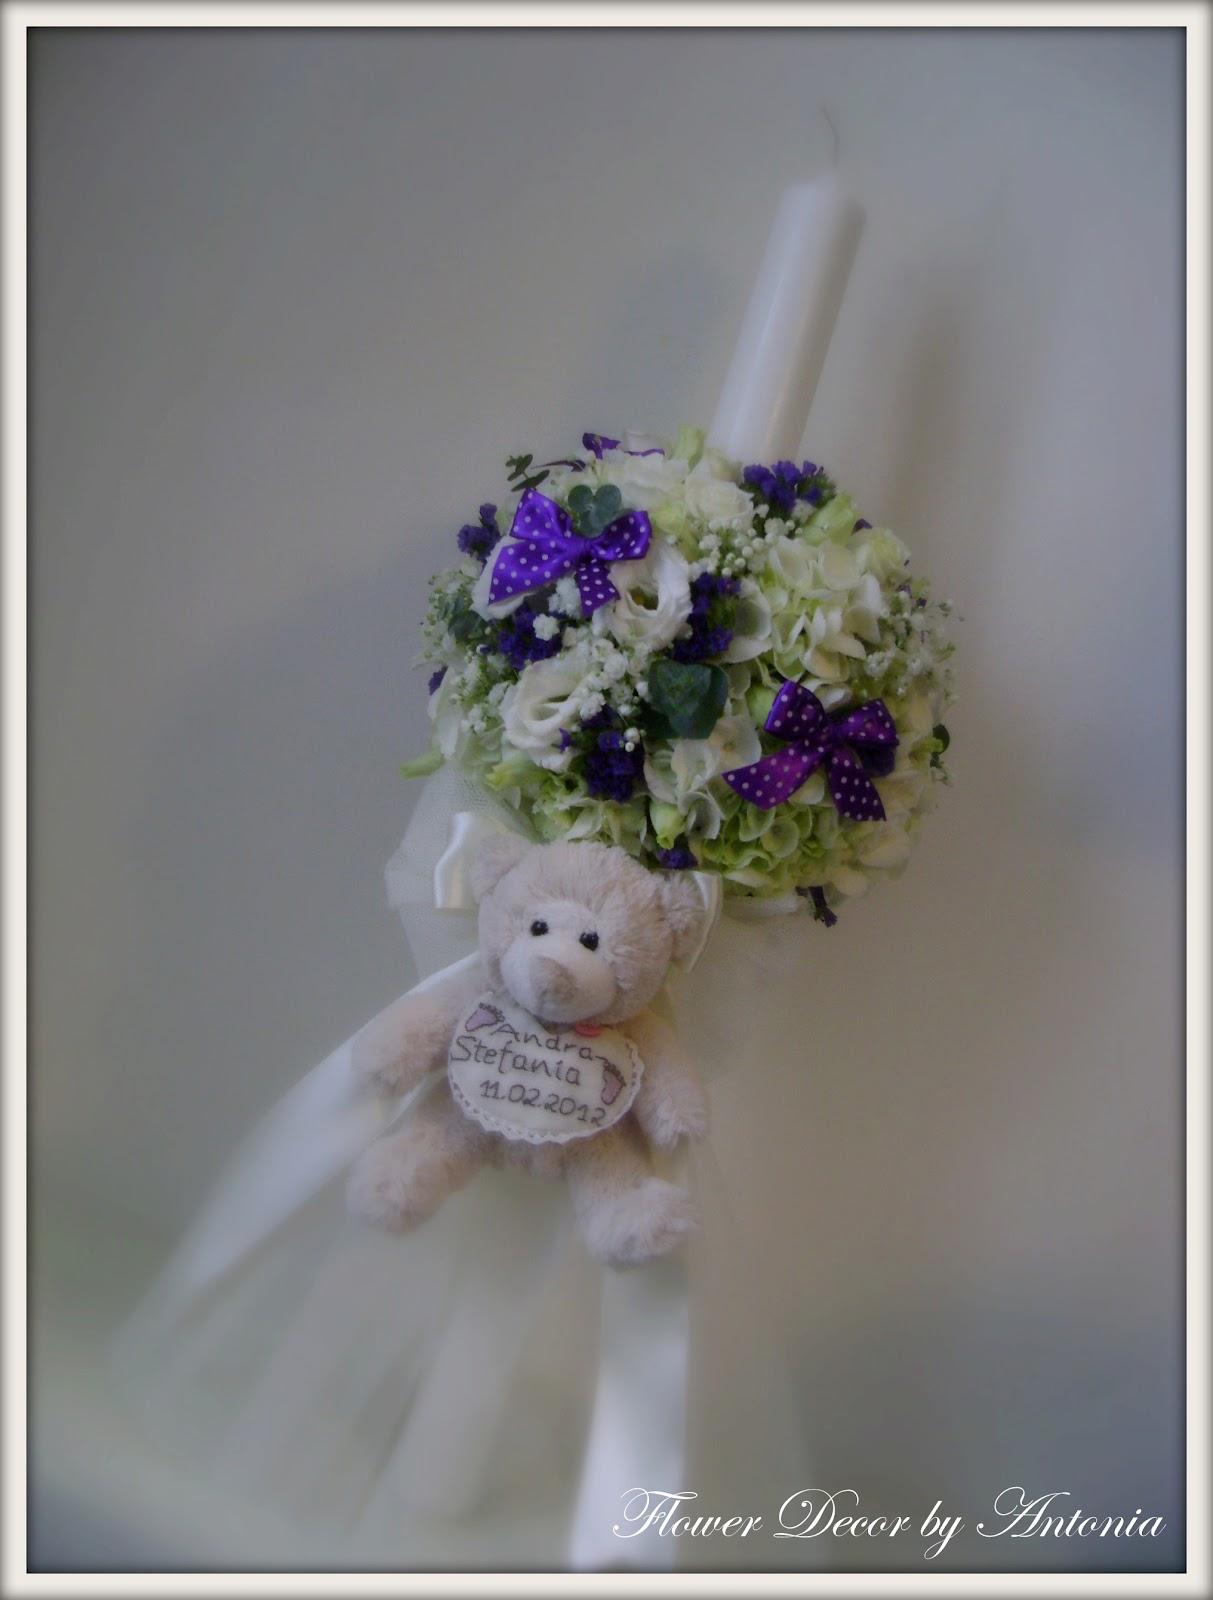 flower decor mini lumanare botez andra stefania hortensie limonium eustoma si eucalipt. Black Bedroom Furniture Sets. Home Design Ideas